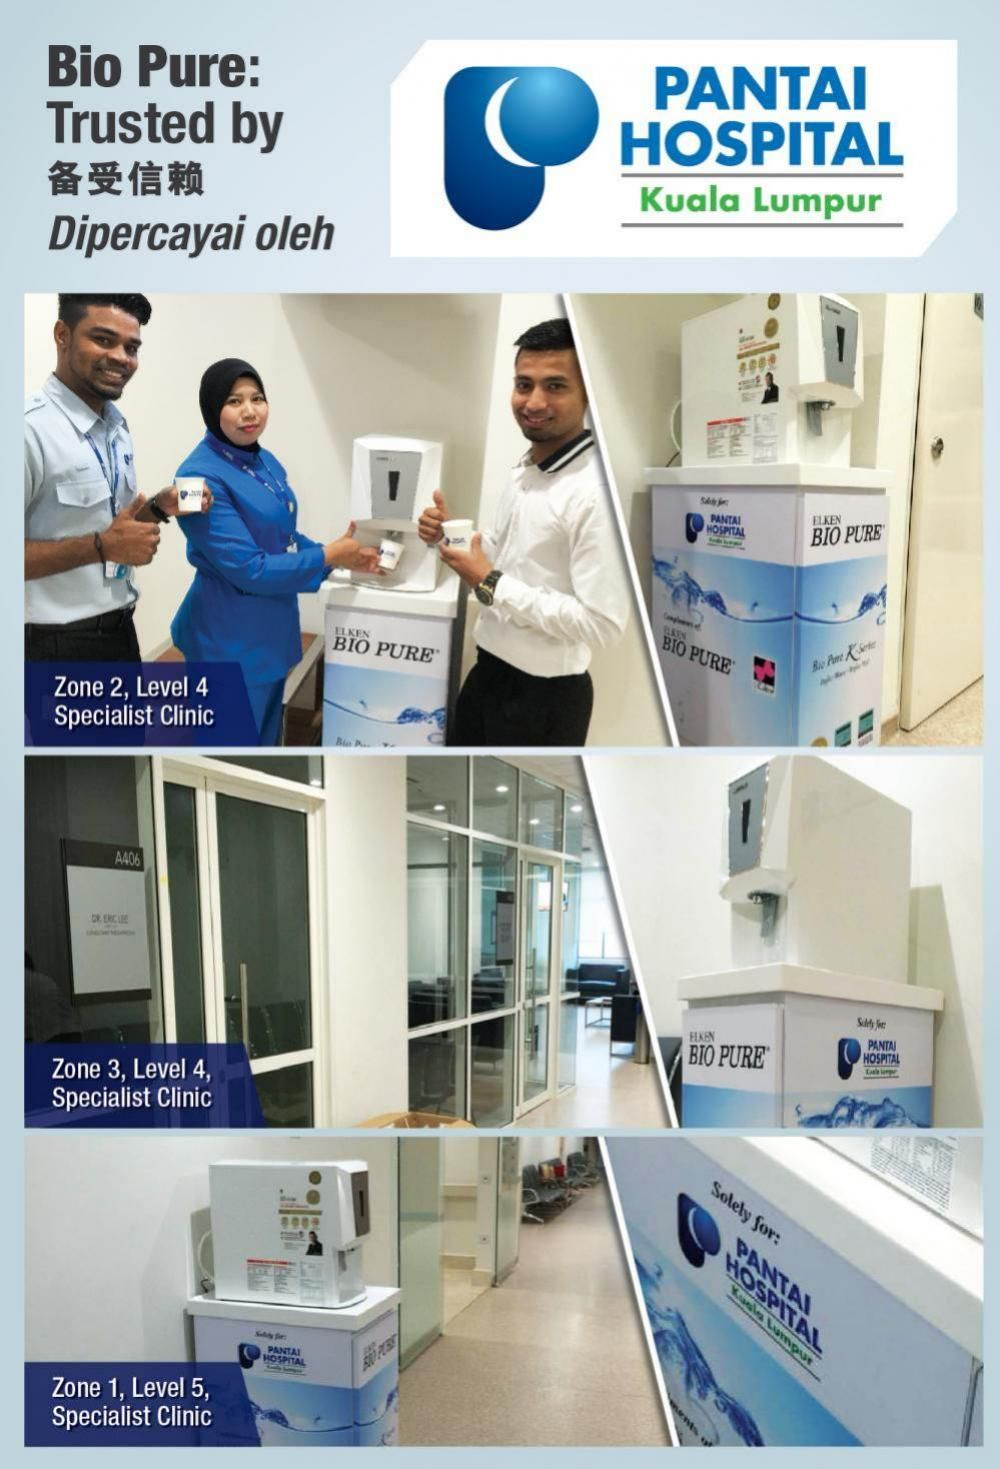 Pin by HealthBoss Lifestyle on Pantai Hospital percaya